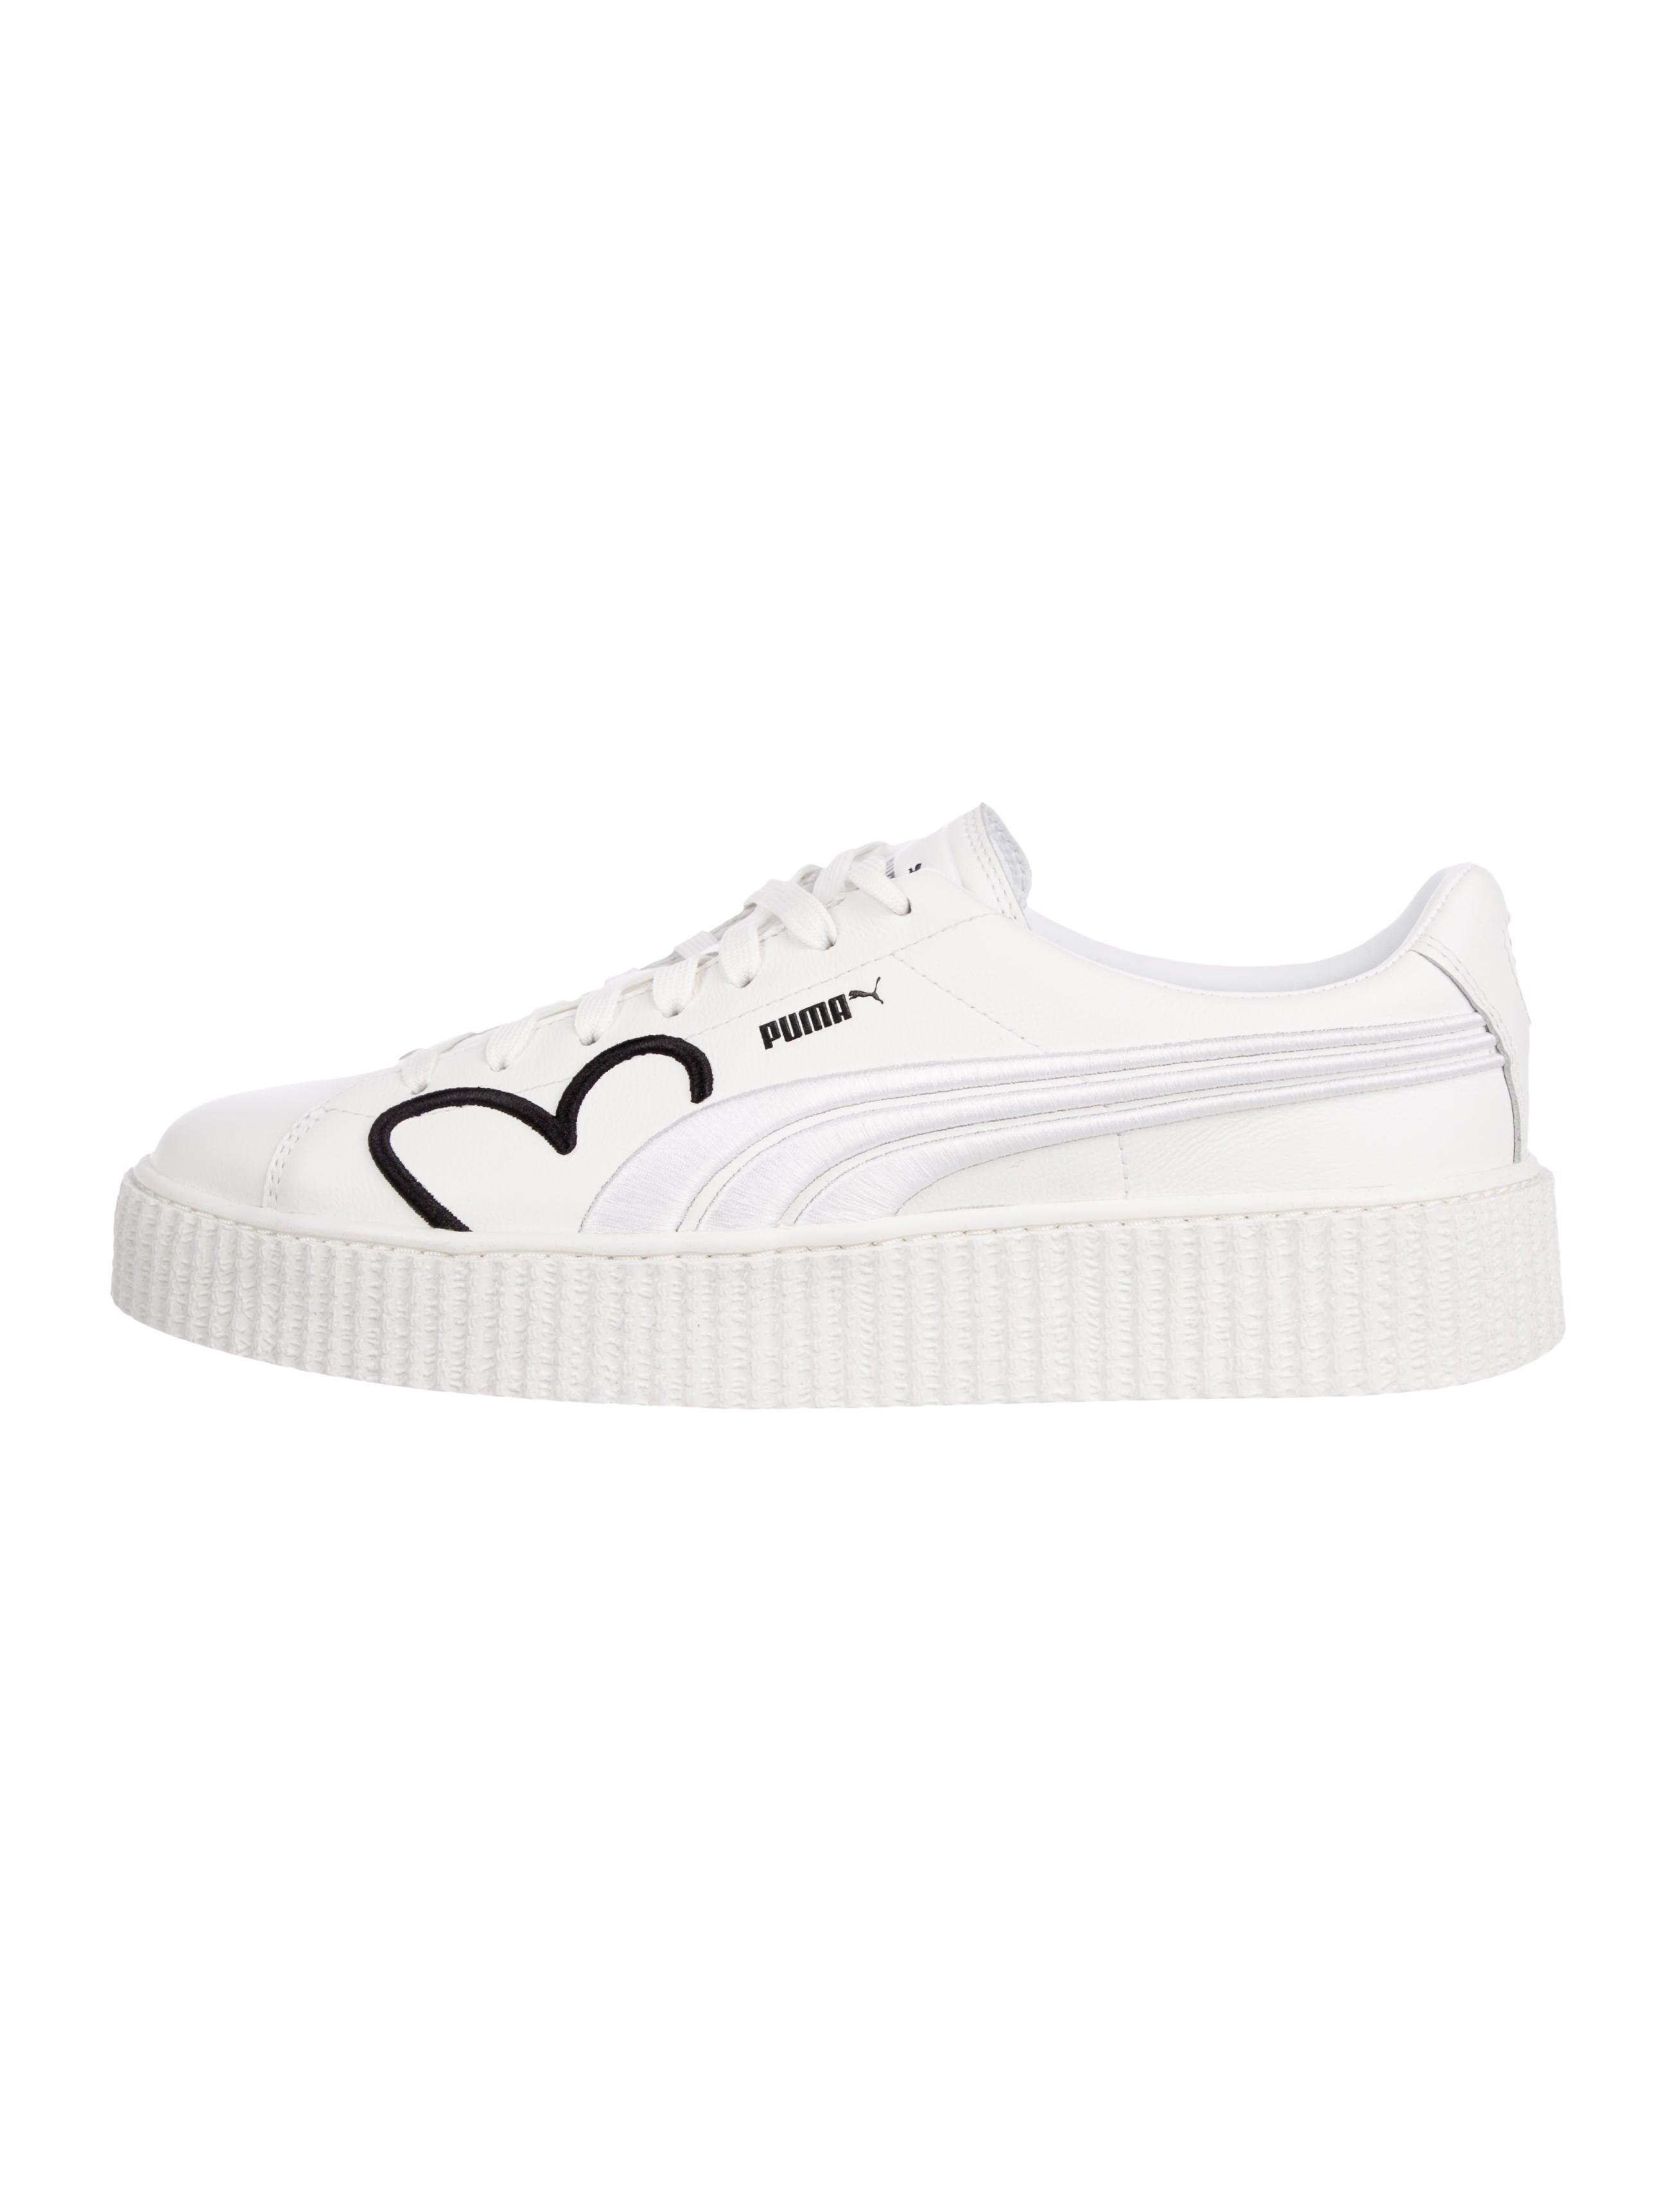 pretty nice b1f76 d96d7 Clara Lionel Creeper Sneakers